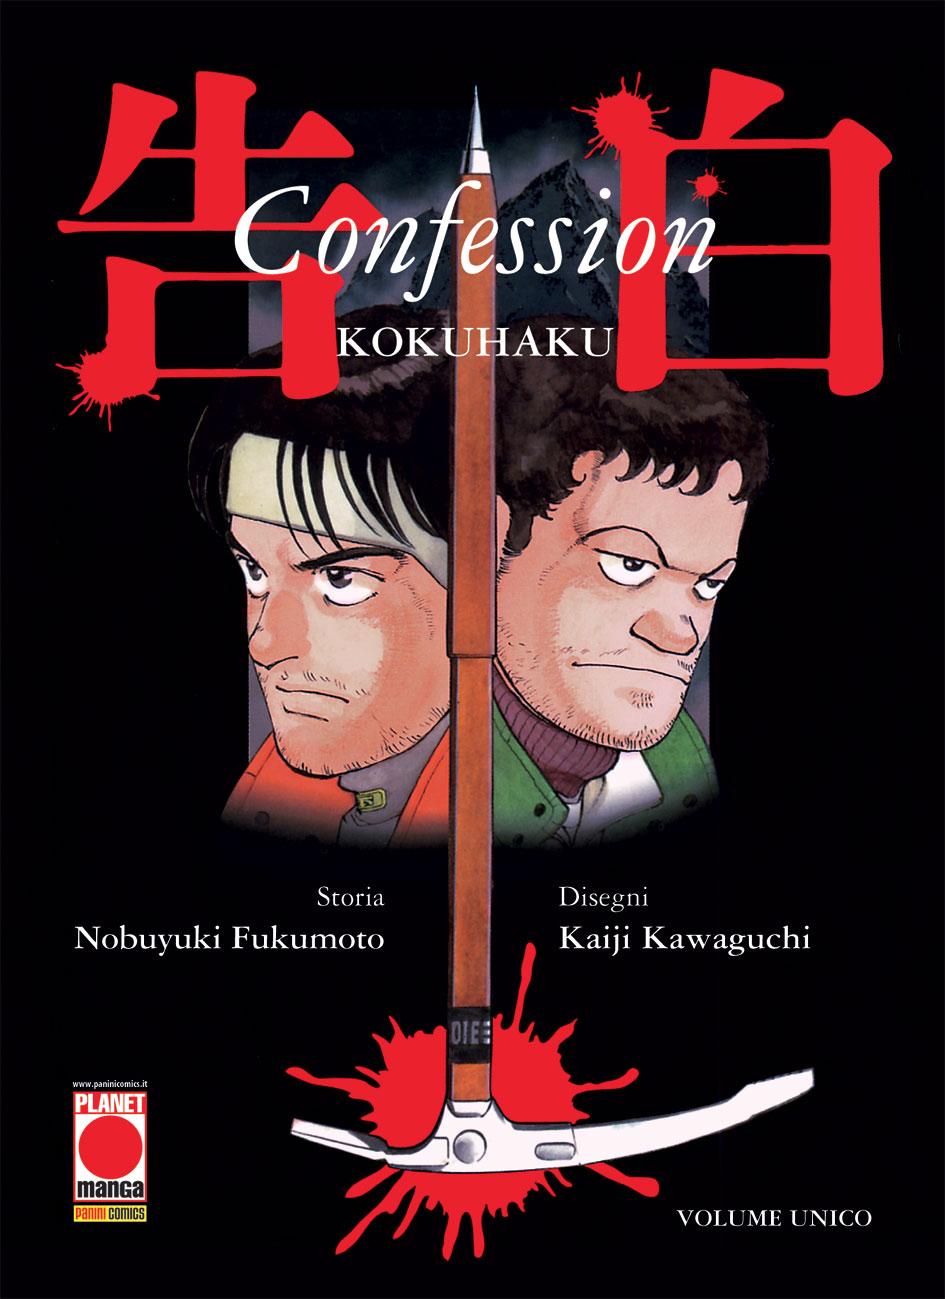 KOKUHAKU_confession.jpg